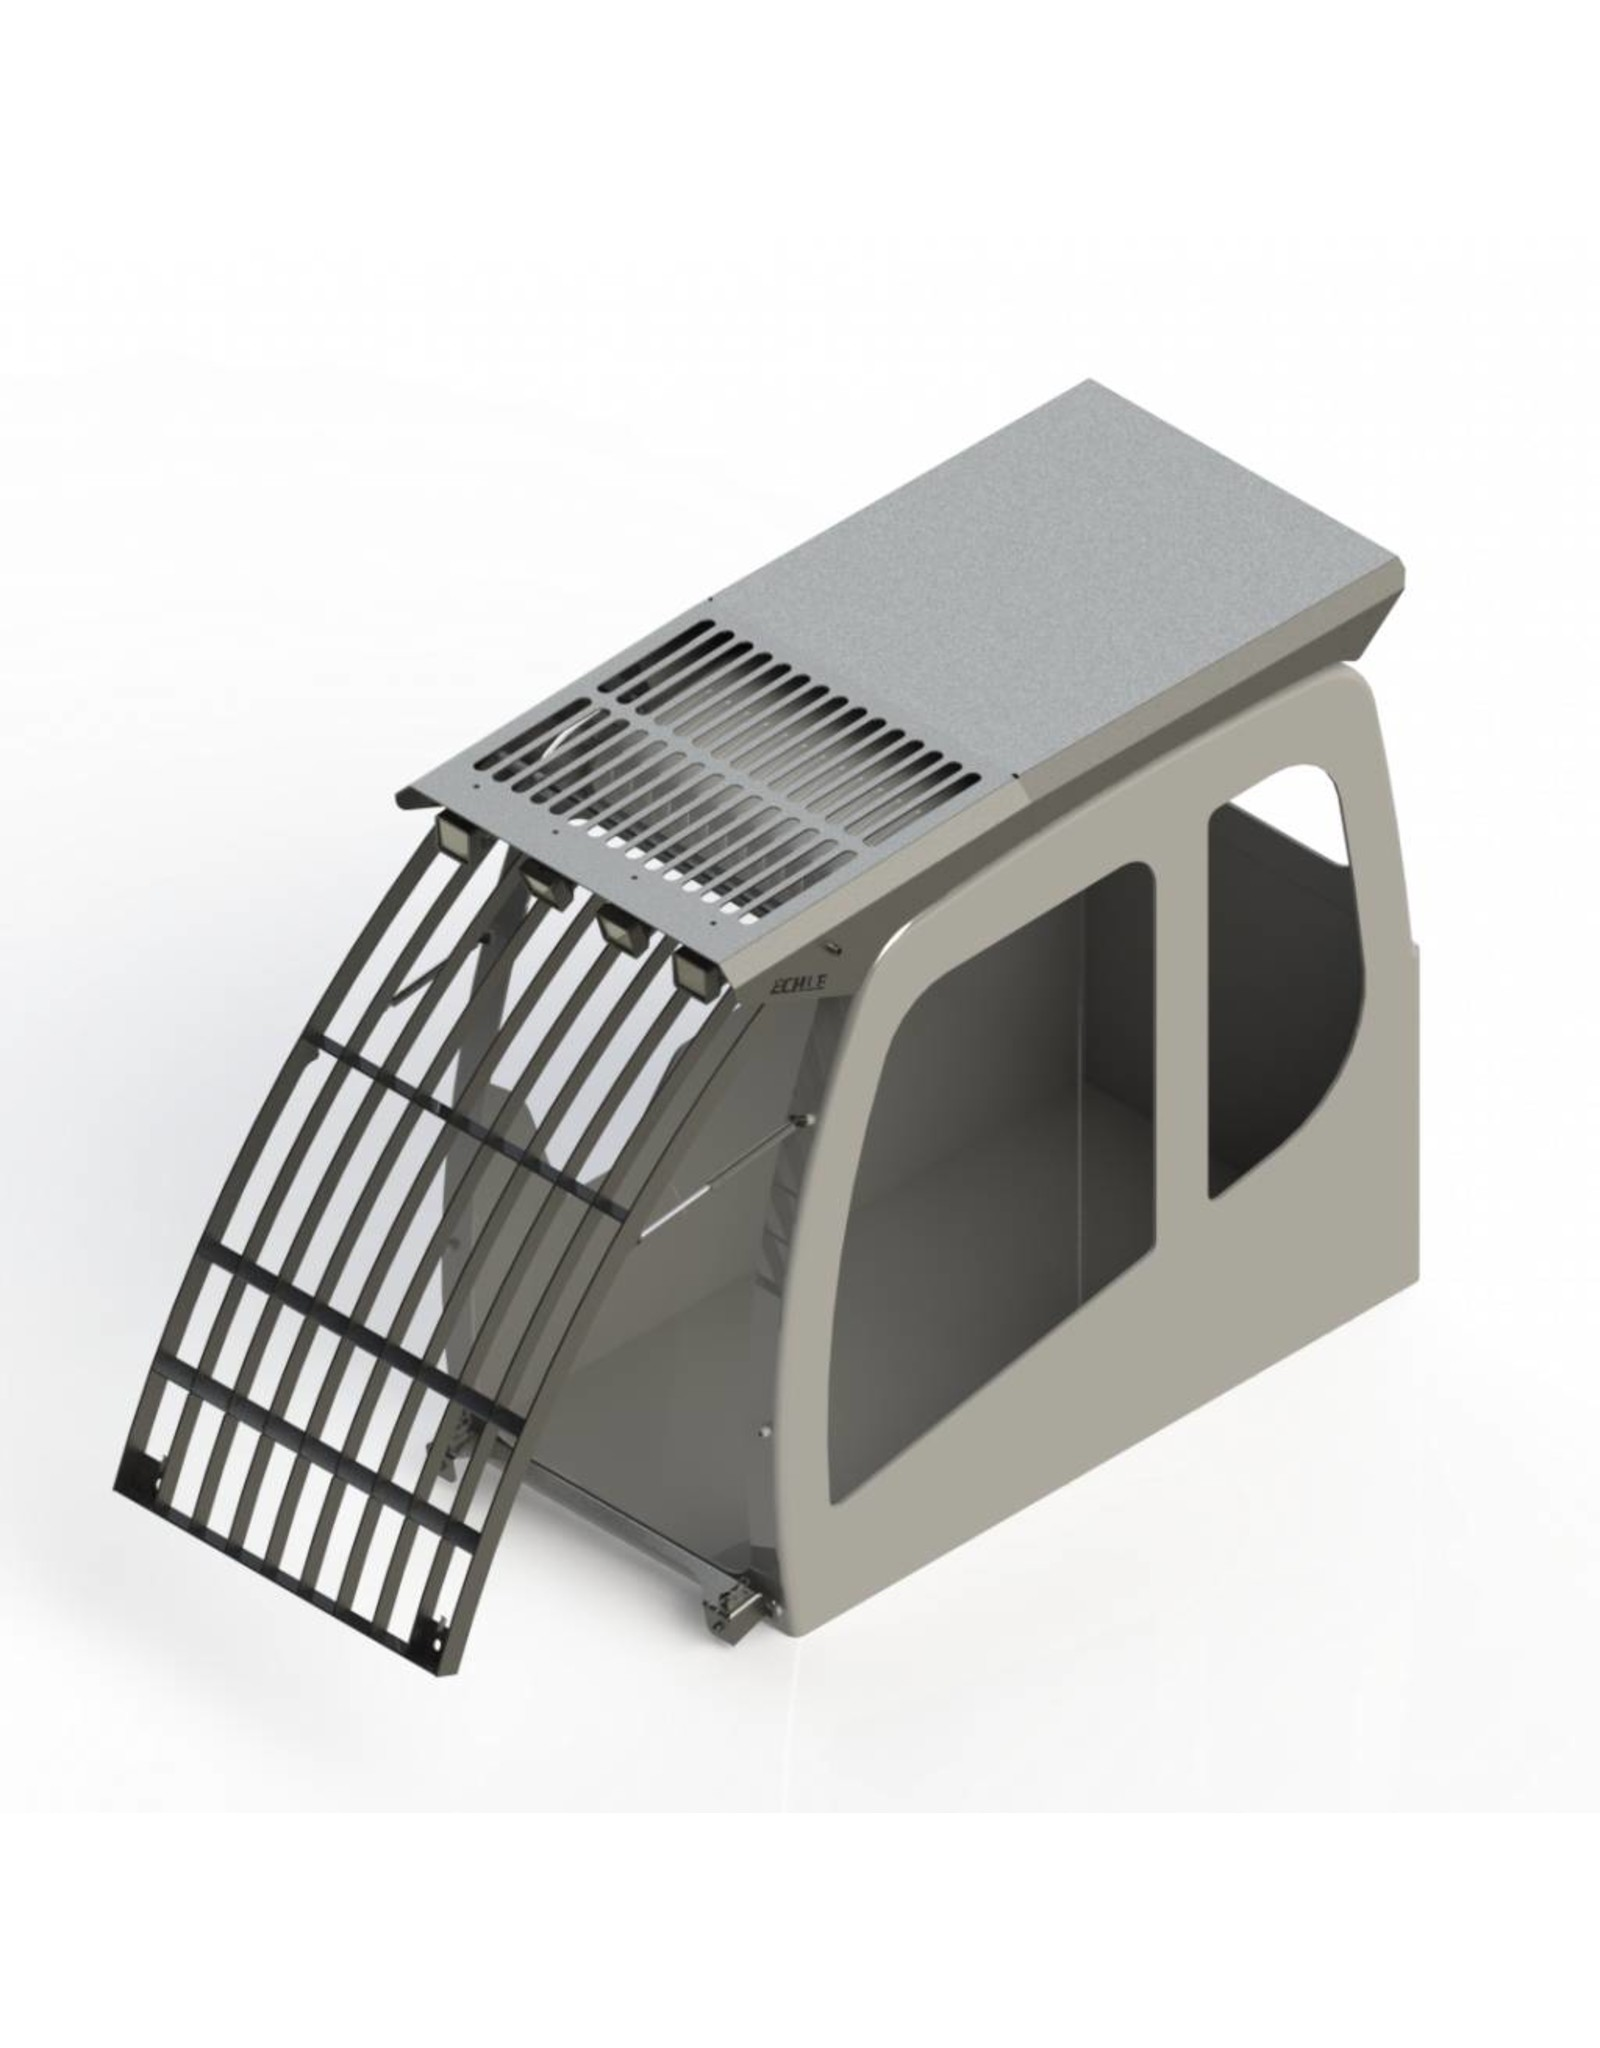 Echle Hartstahl GmbH FOPS pour Liebherr R 950 Demolition